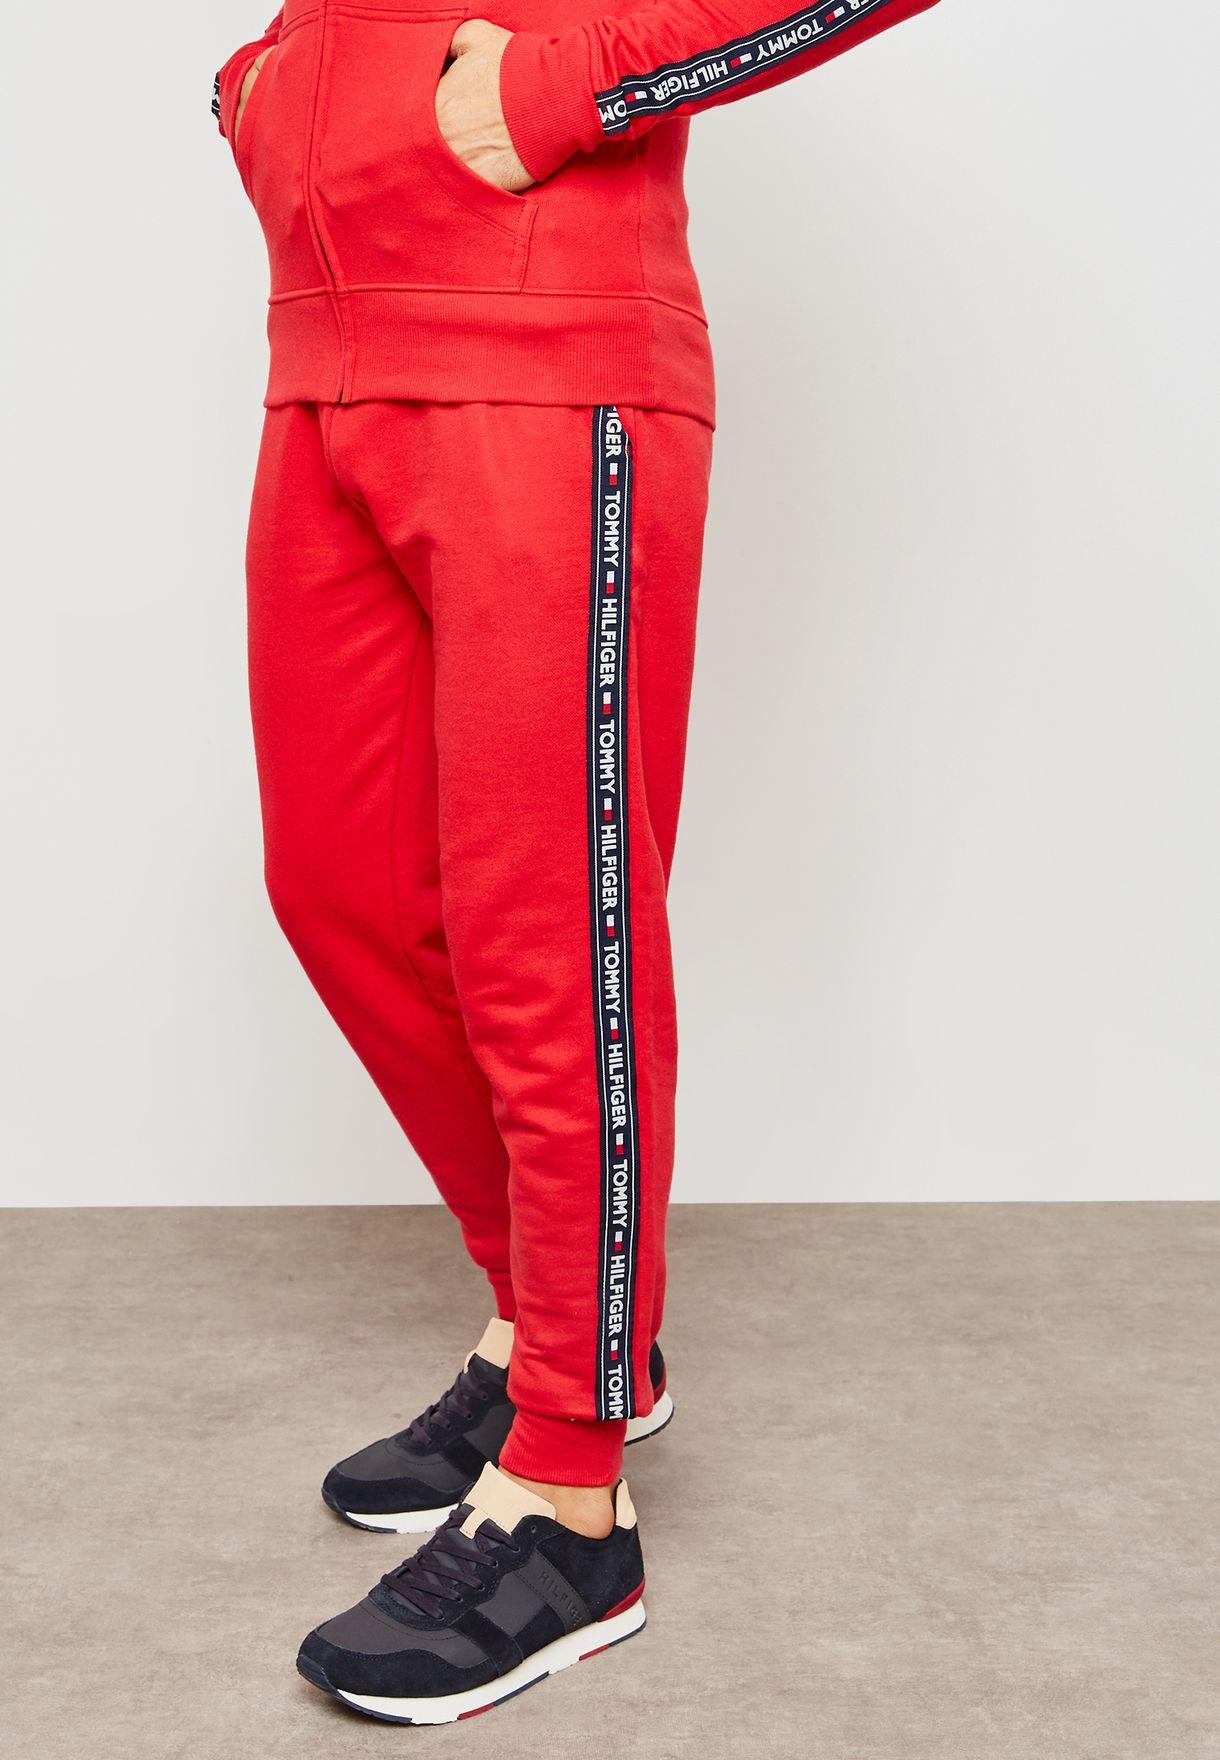 e3c150e3 Shop Tommy Hilfiger red Logo Stripe Cuffed Sweatpants UM0UM00706-611 ...